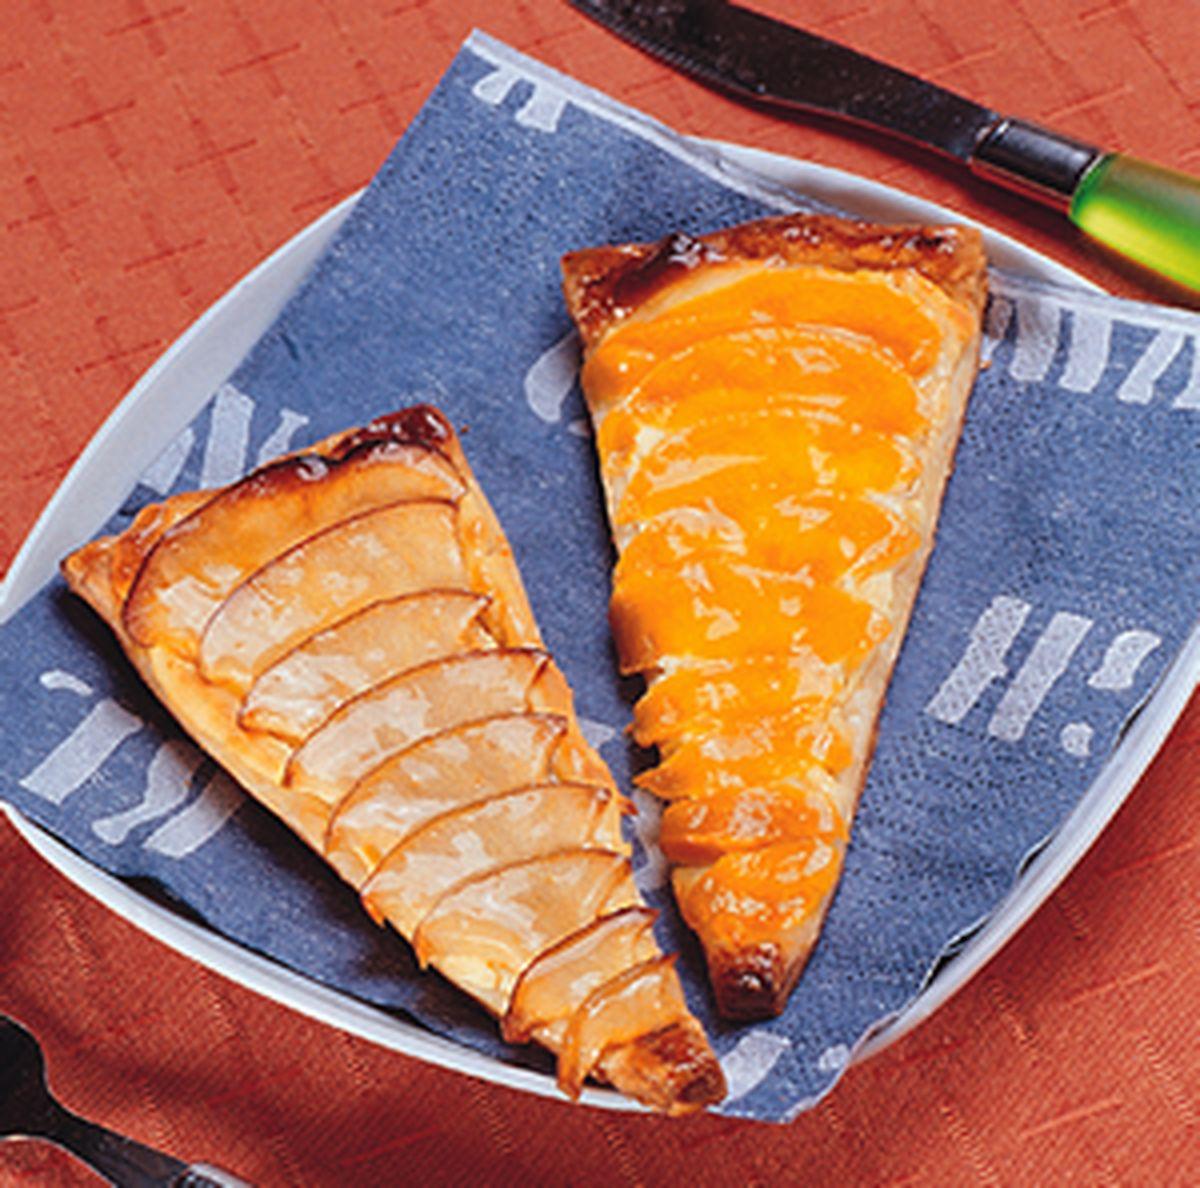 食譜:乳酪水果派